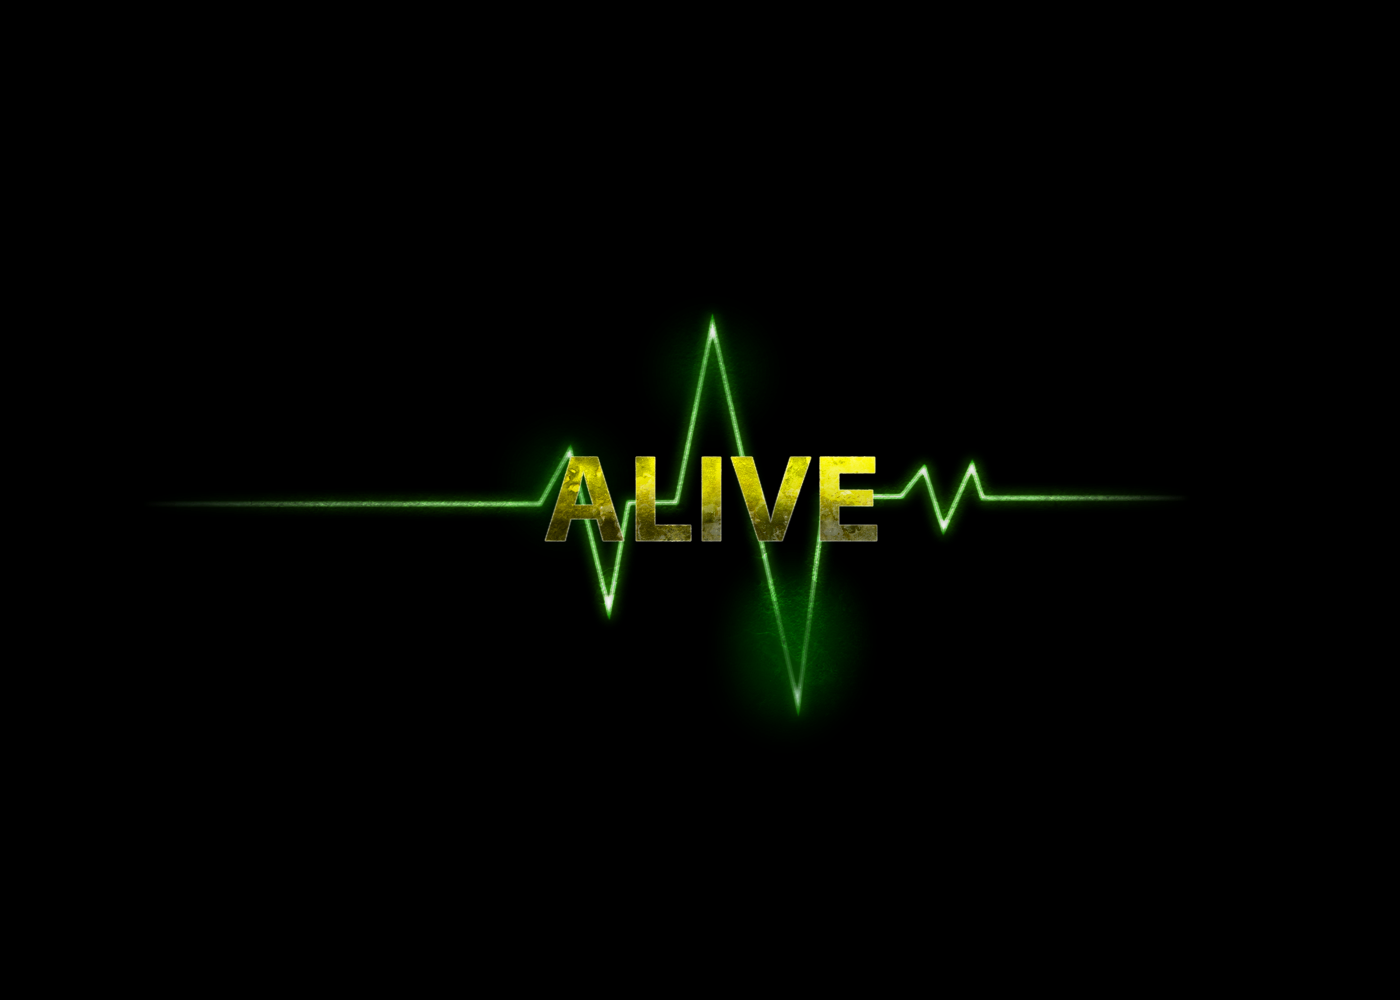 Alive Wallpaper 731583 1400x1000px 1400x1000